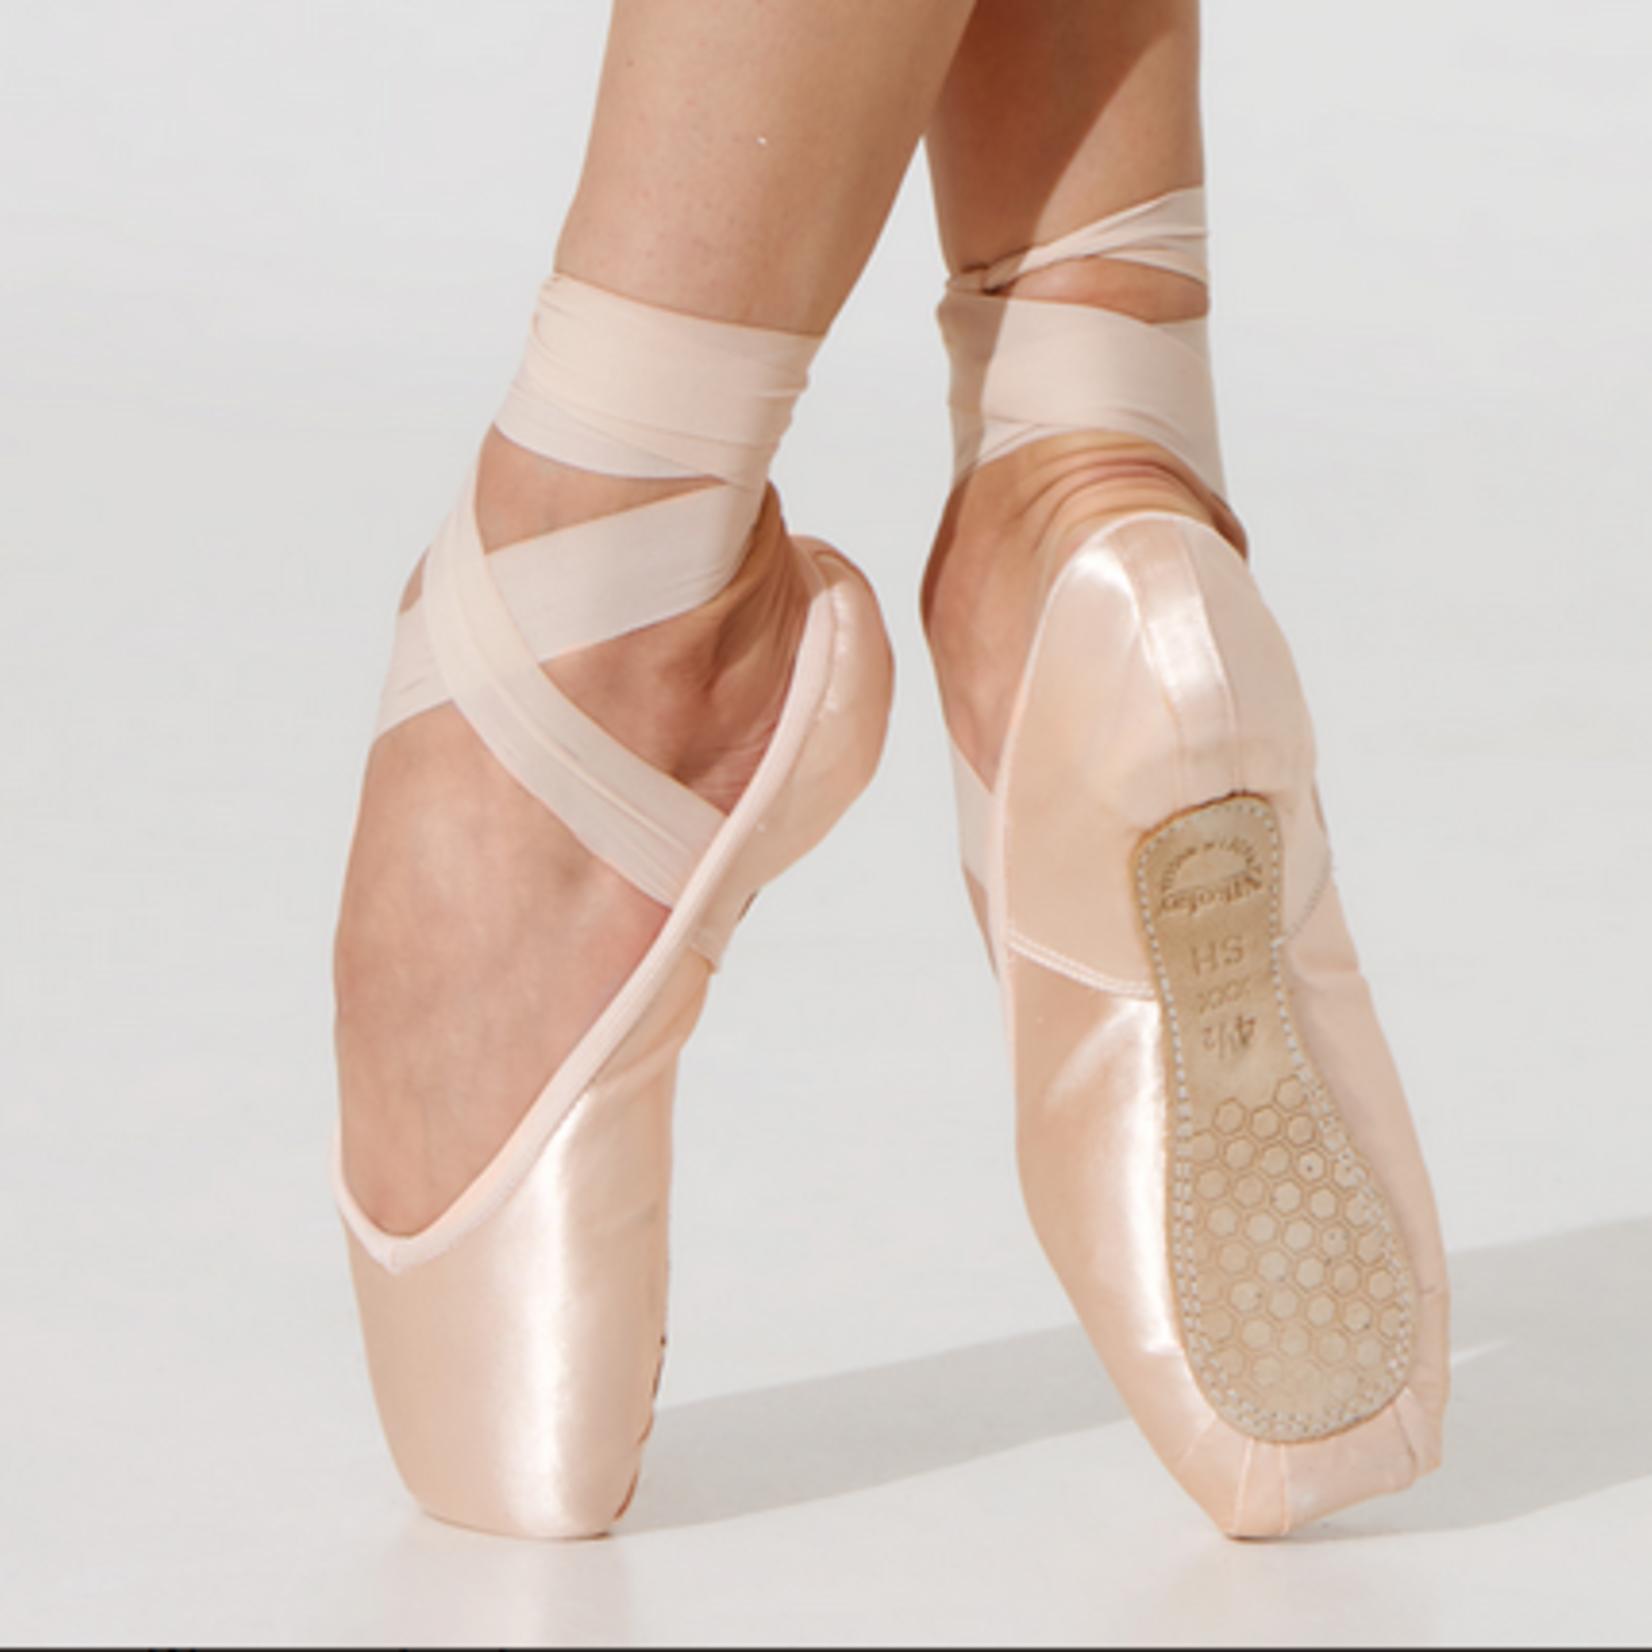 Nikolay Nikolay Streampointe Pointe Shoes